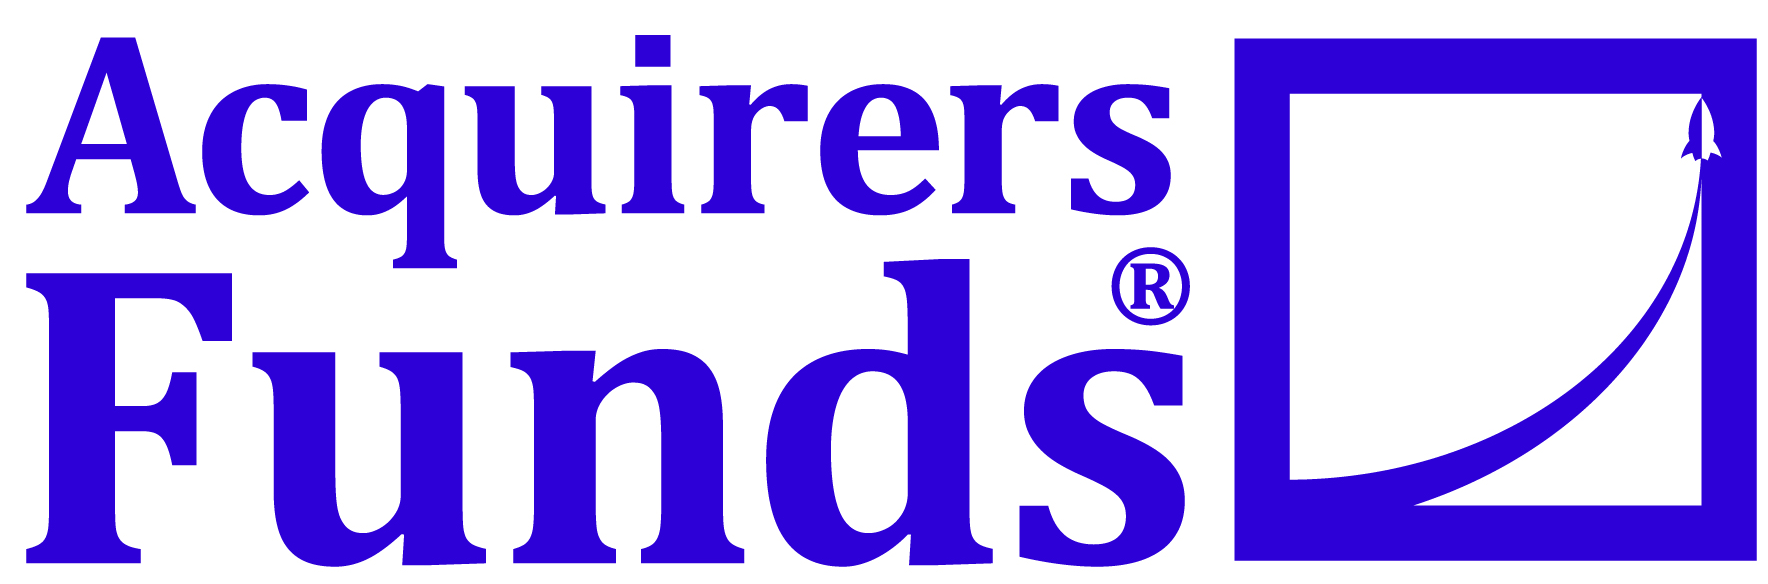 Blog | Stock Screener - The Acquirer's Multiple®